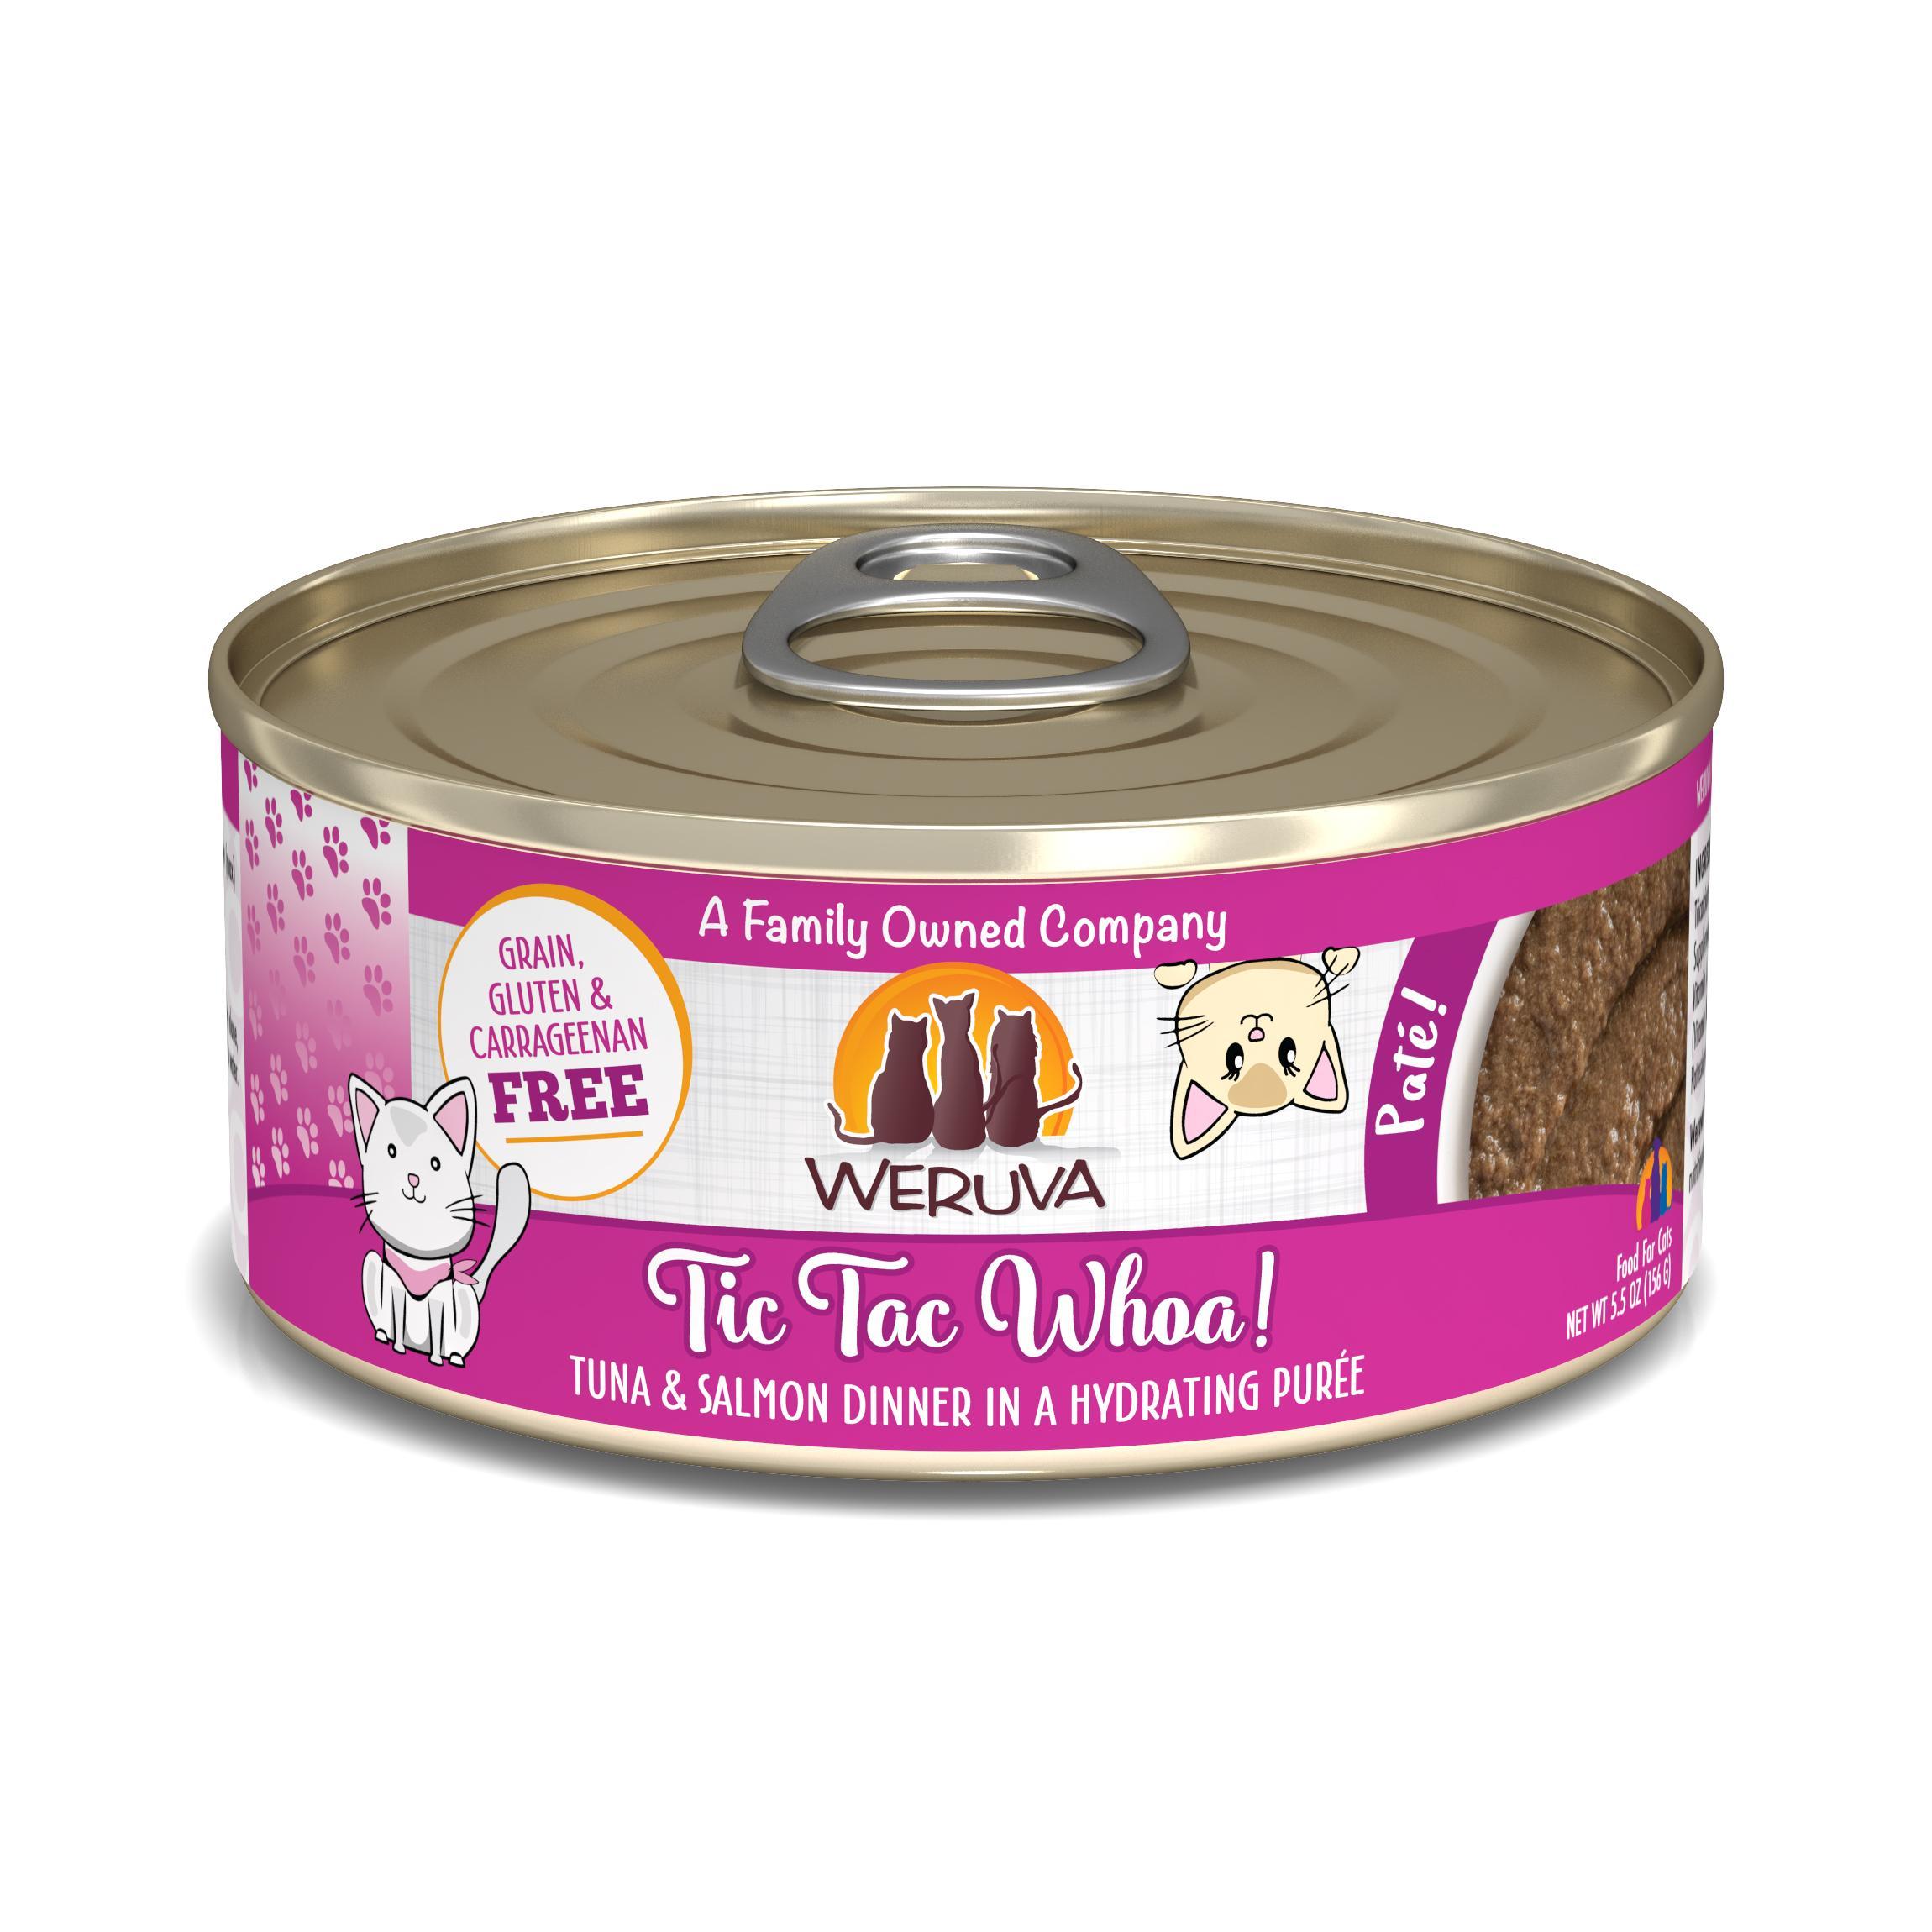 Weruva Cat Pate Tic Tac Whoa! Tuna & Salmon Dinner in Puree Wet Cat Food, 5.5-oz can